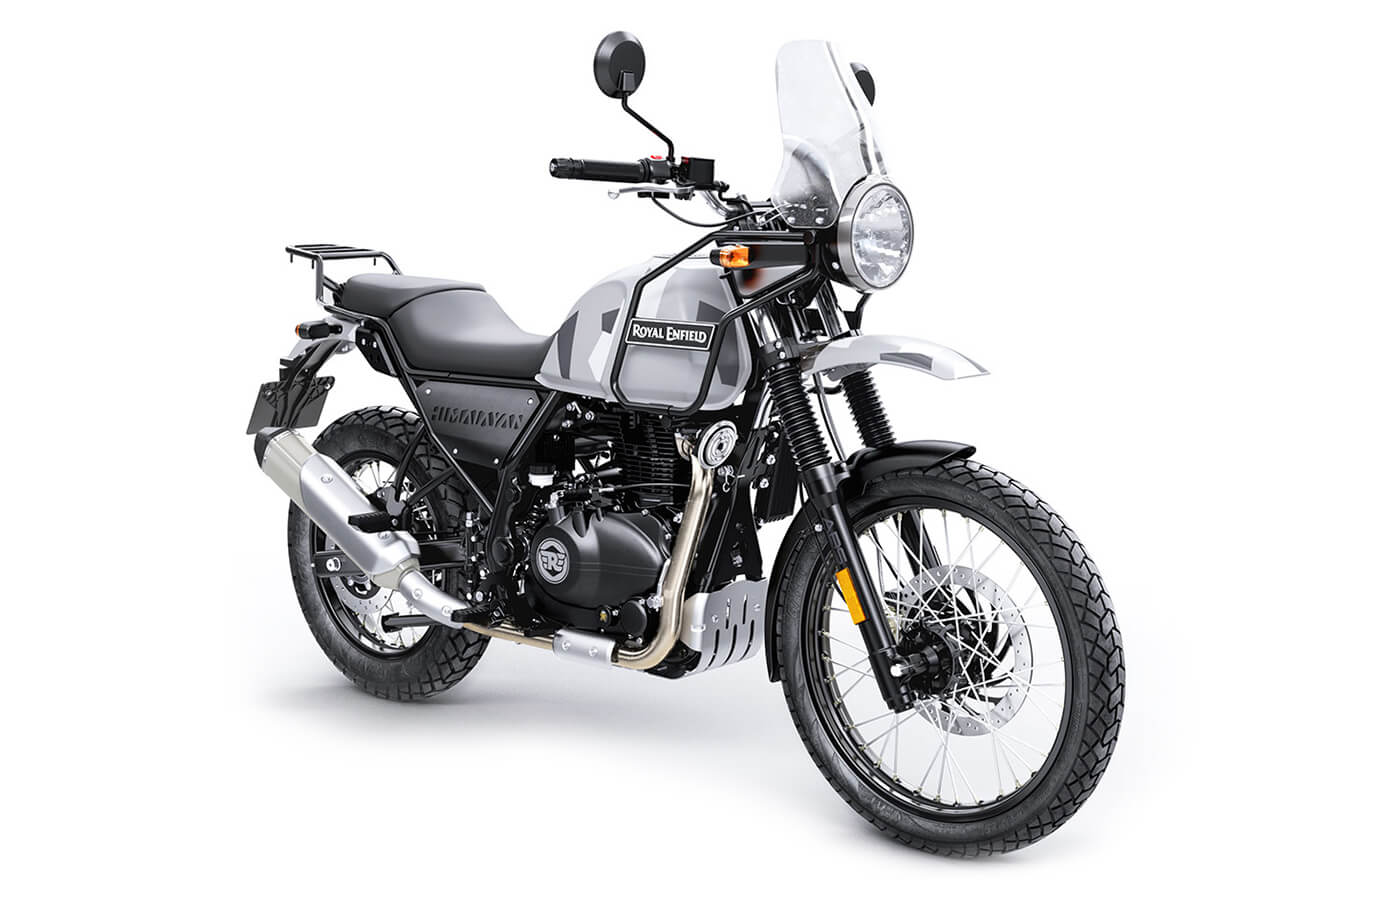 Royal Enfield Himalayan 411cc Colour Sleet Manhattan Motorcycles Ltd